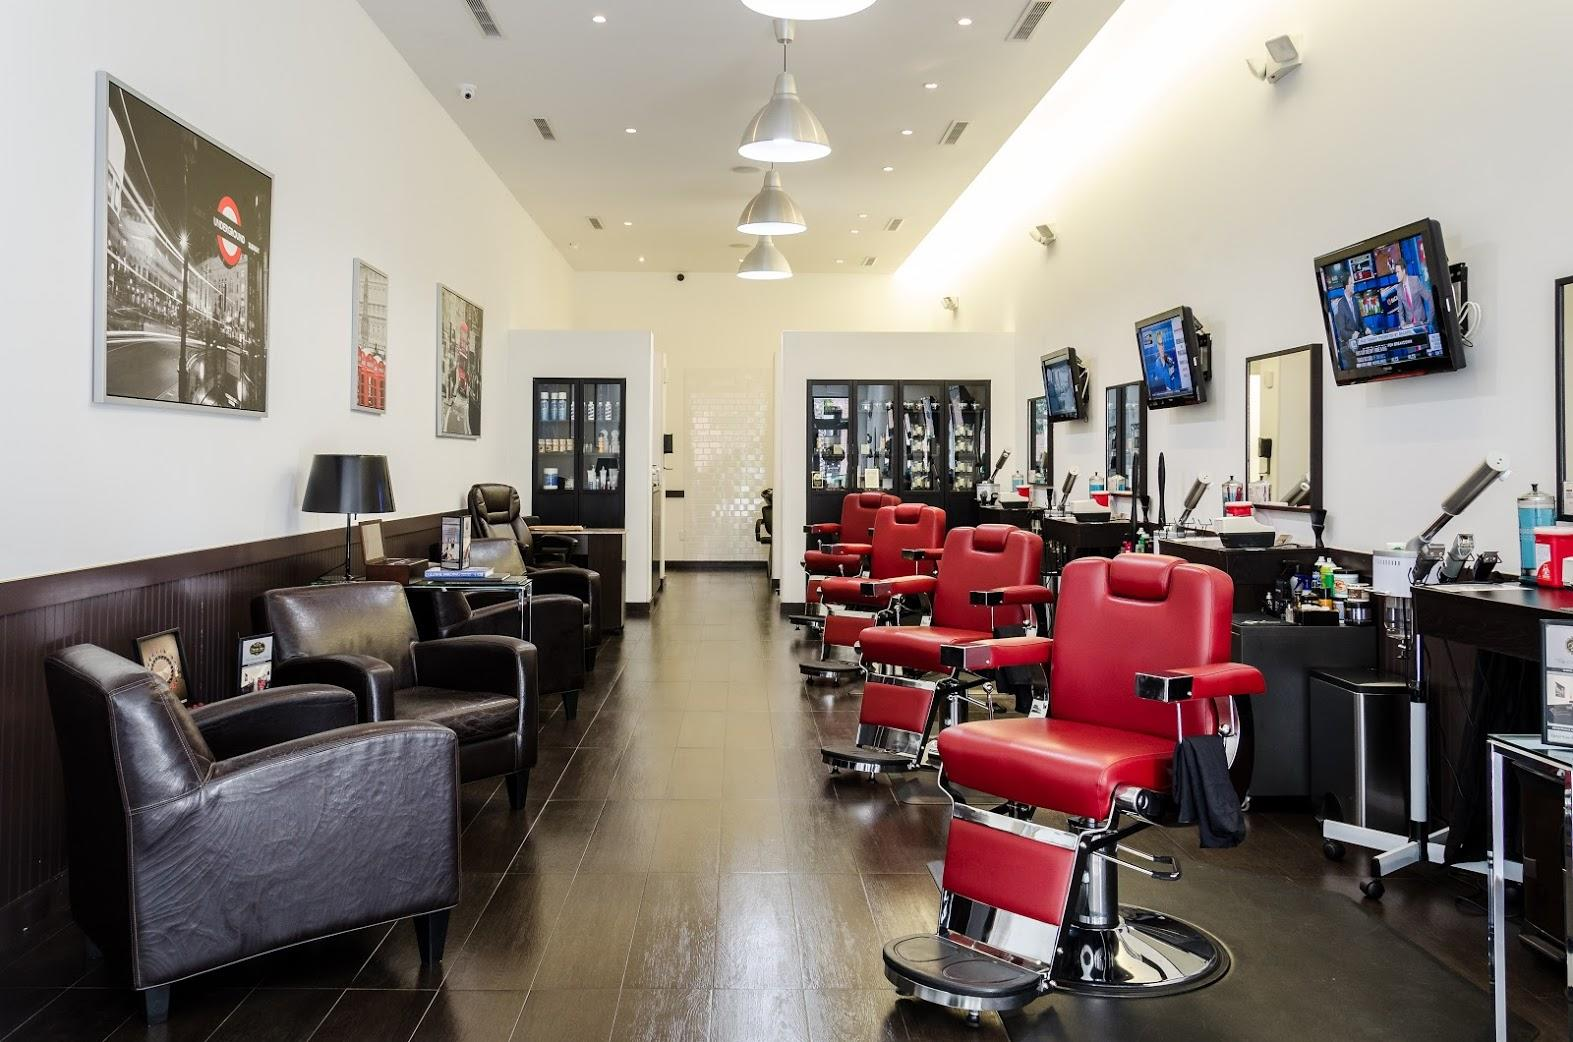 Prestigious Image Barbershop and Spa image 1